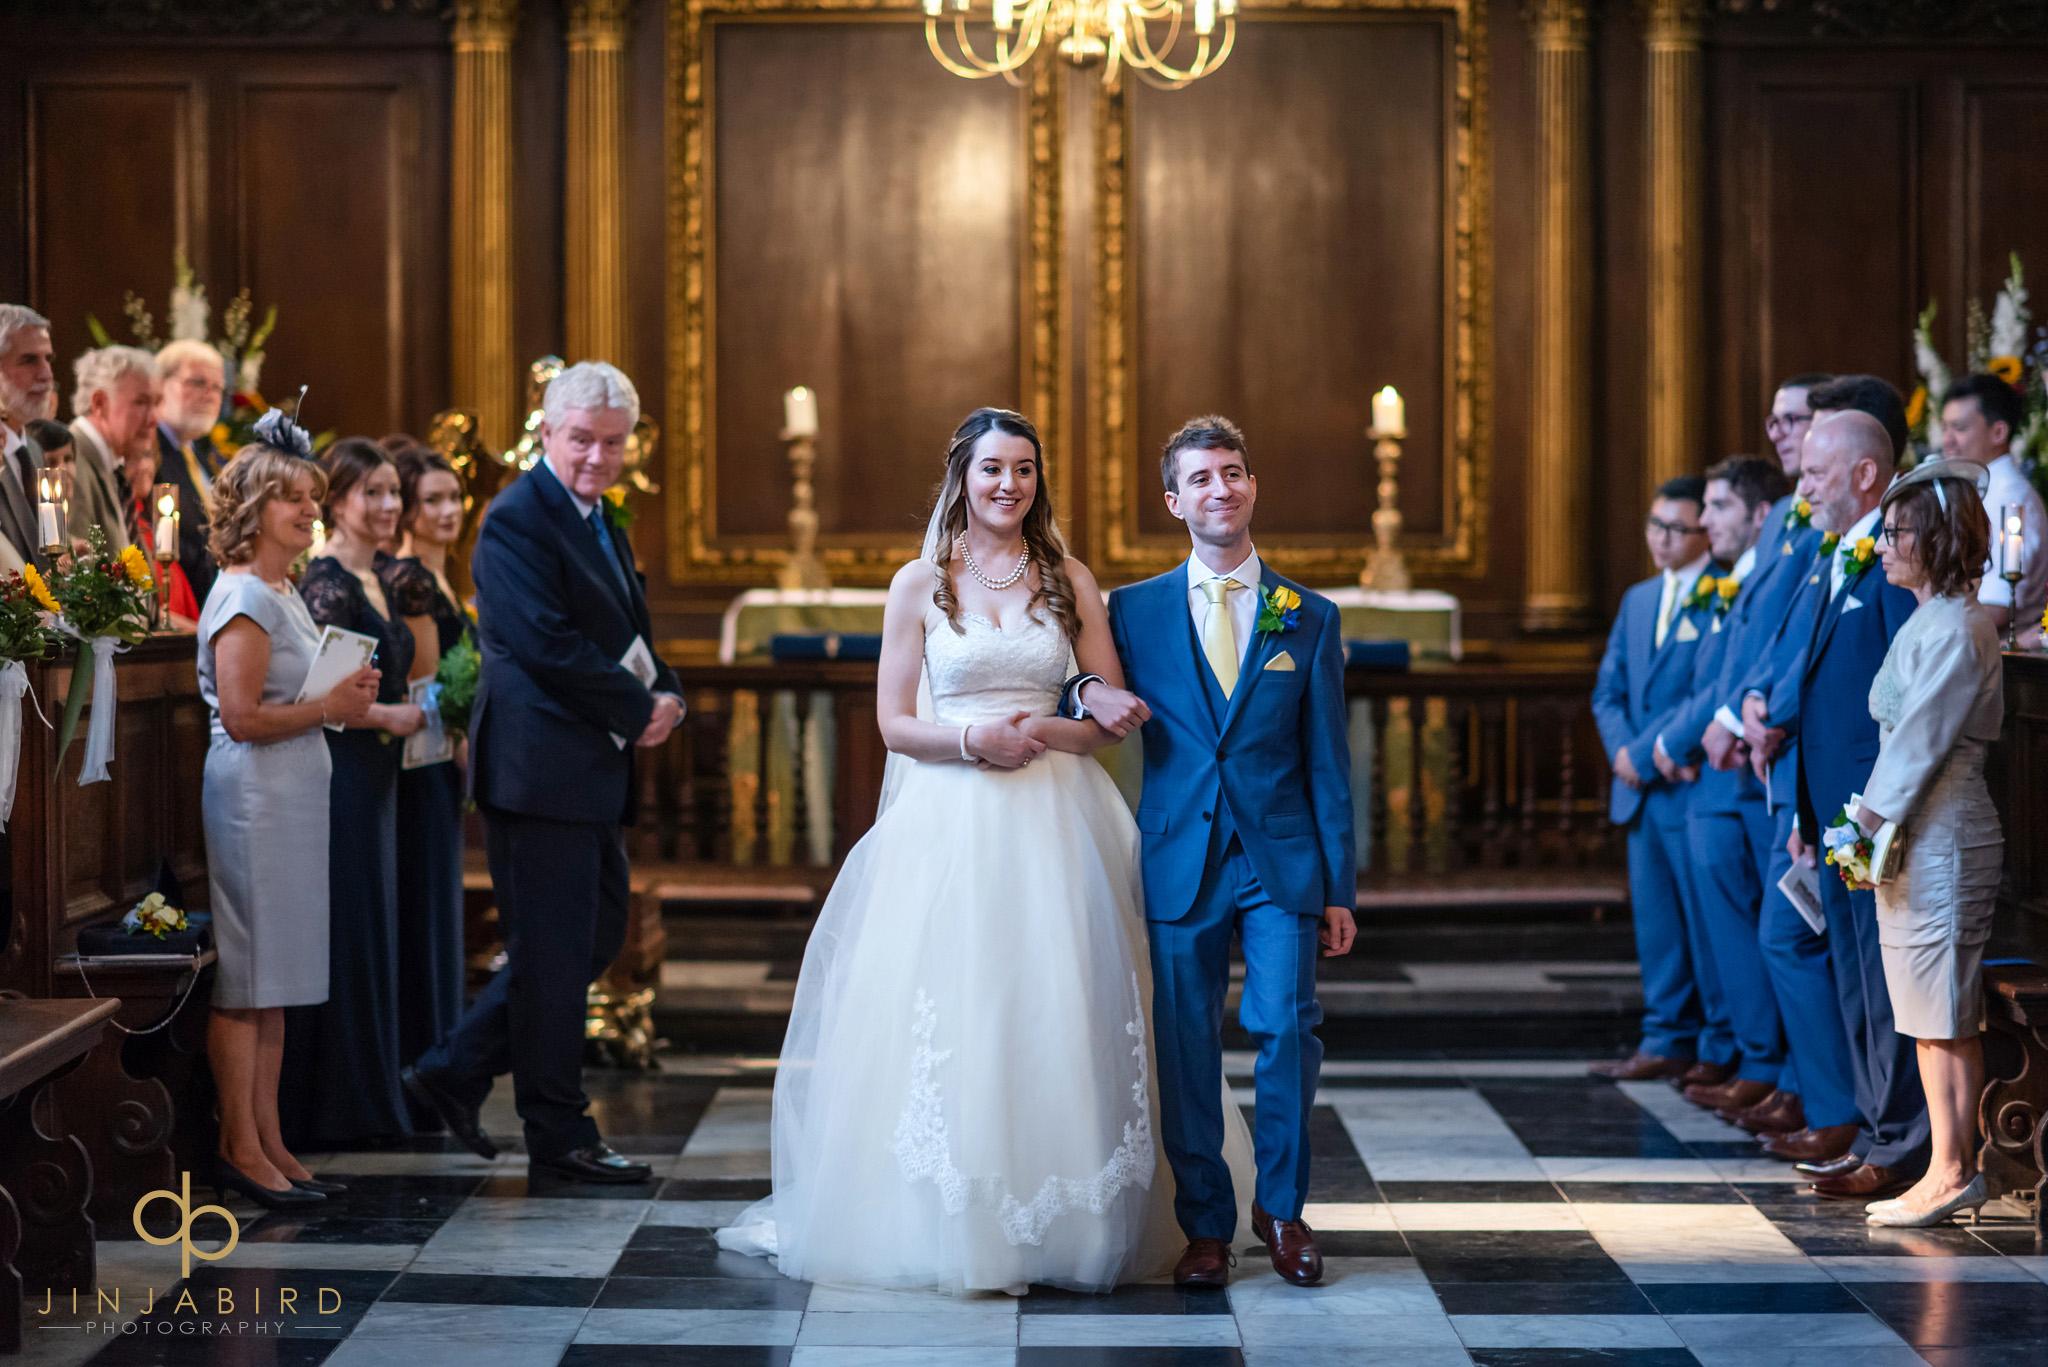 documentary wedding photographer christs college cambridge